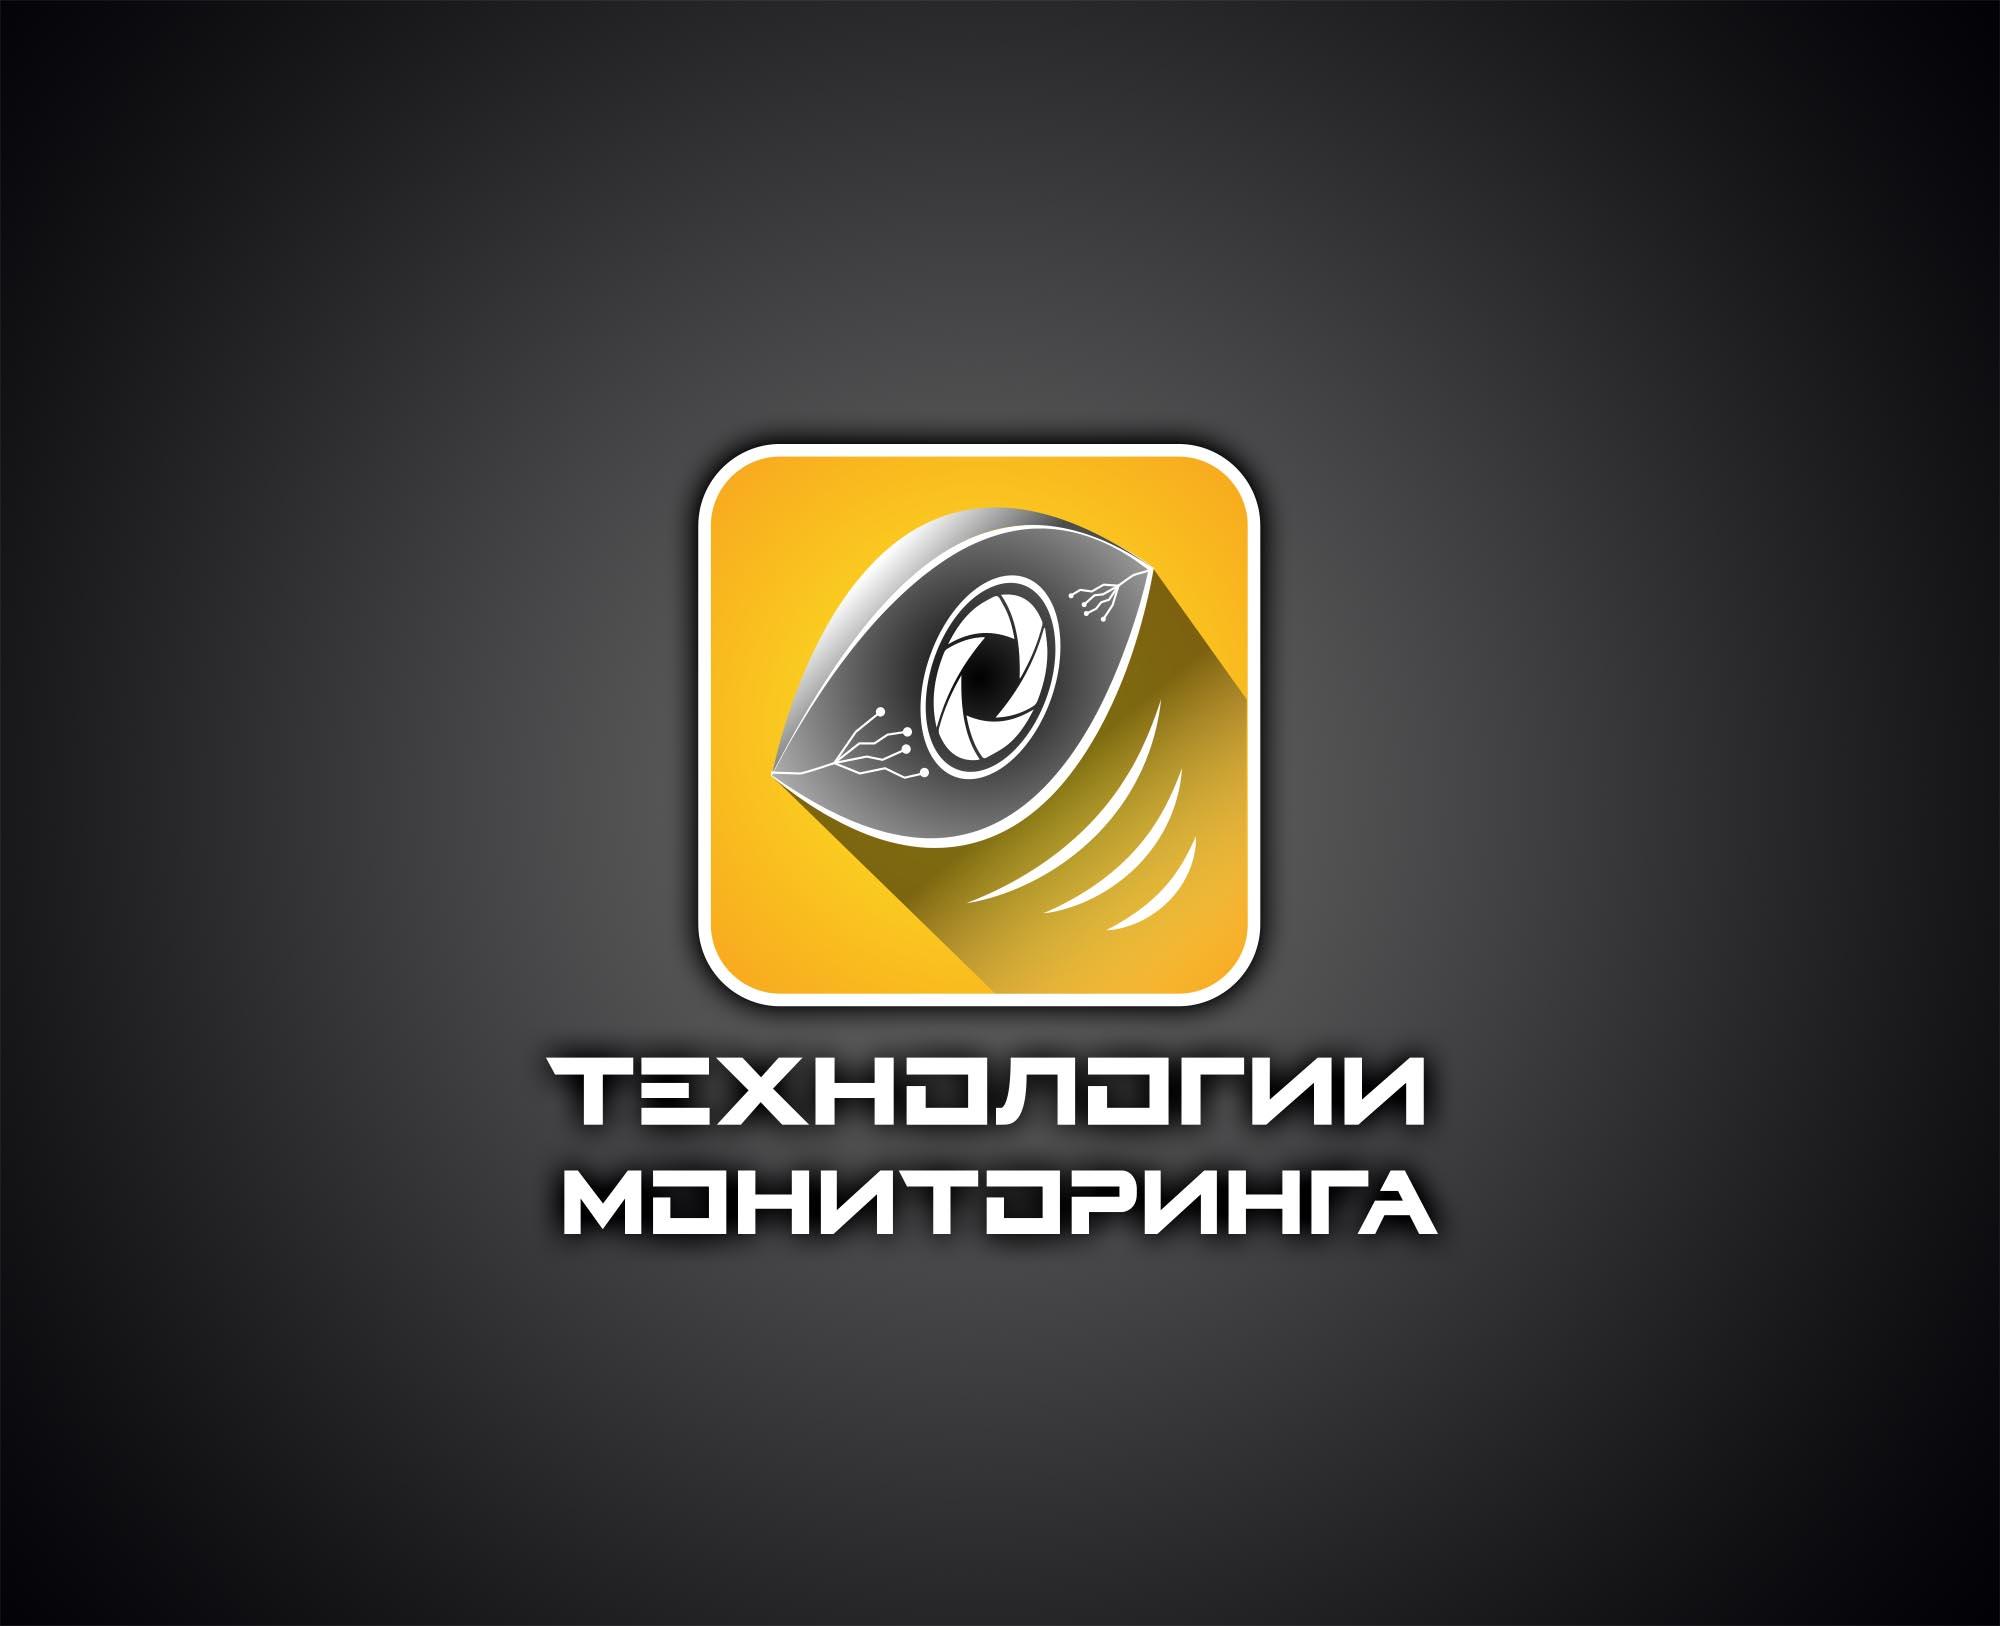 Разработка логотипа фото f_903596de59c2900e.jpg